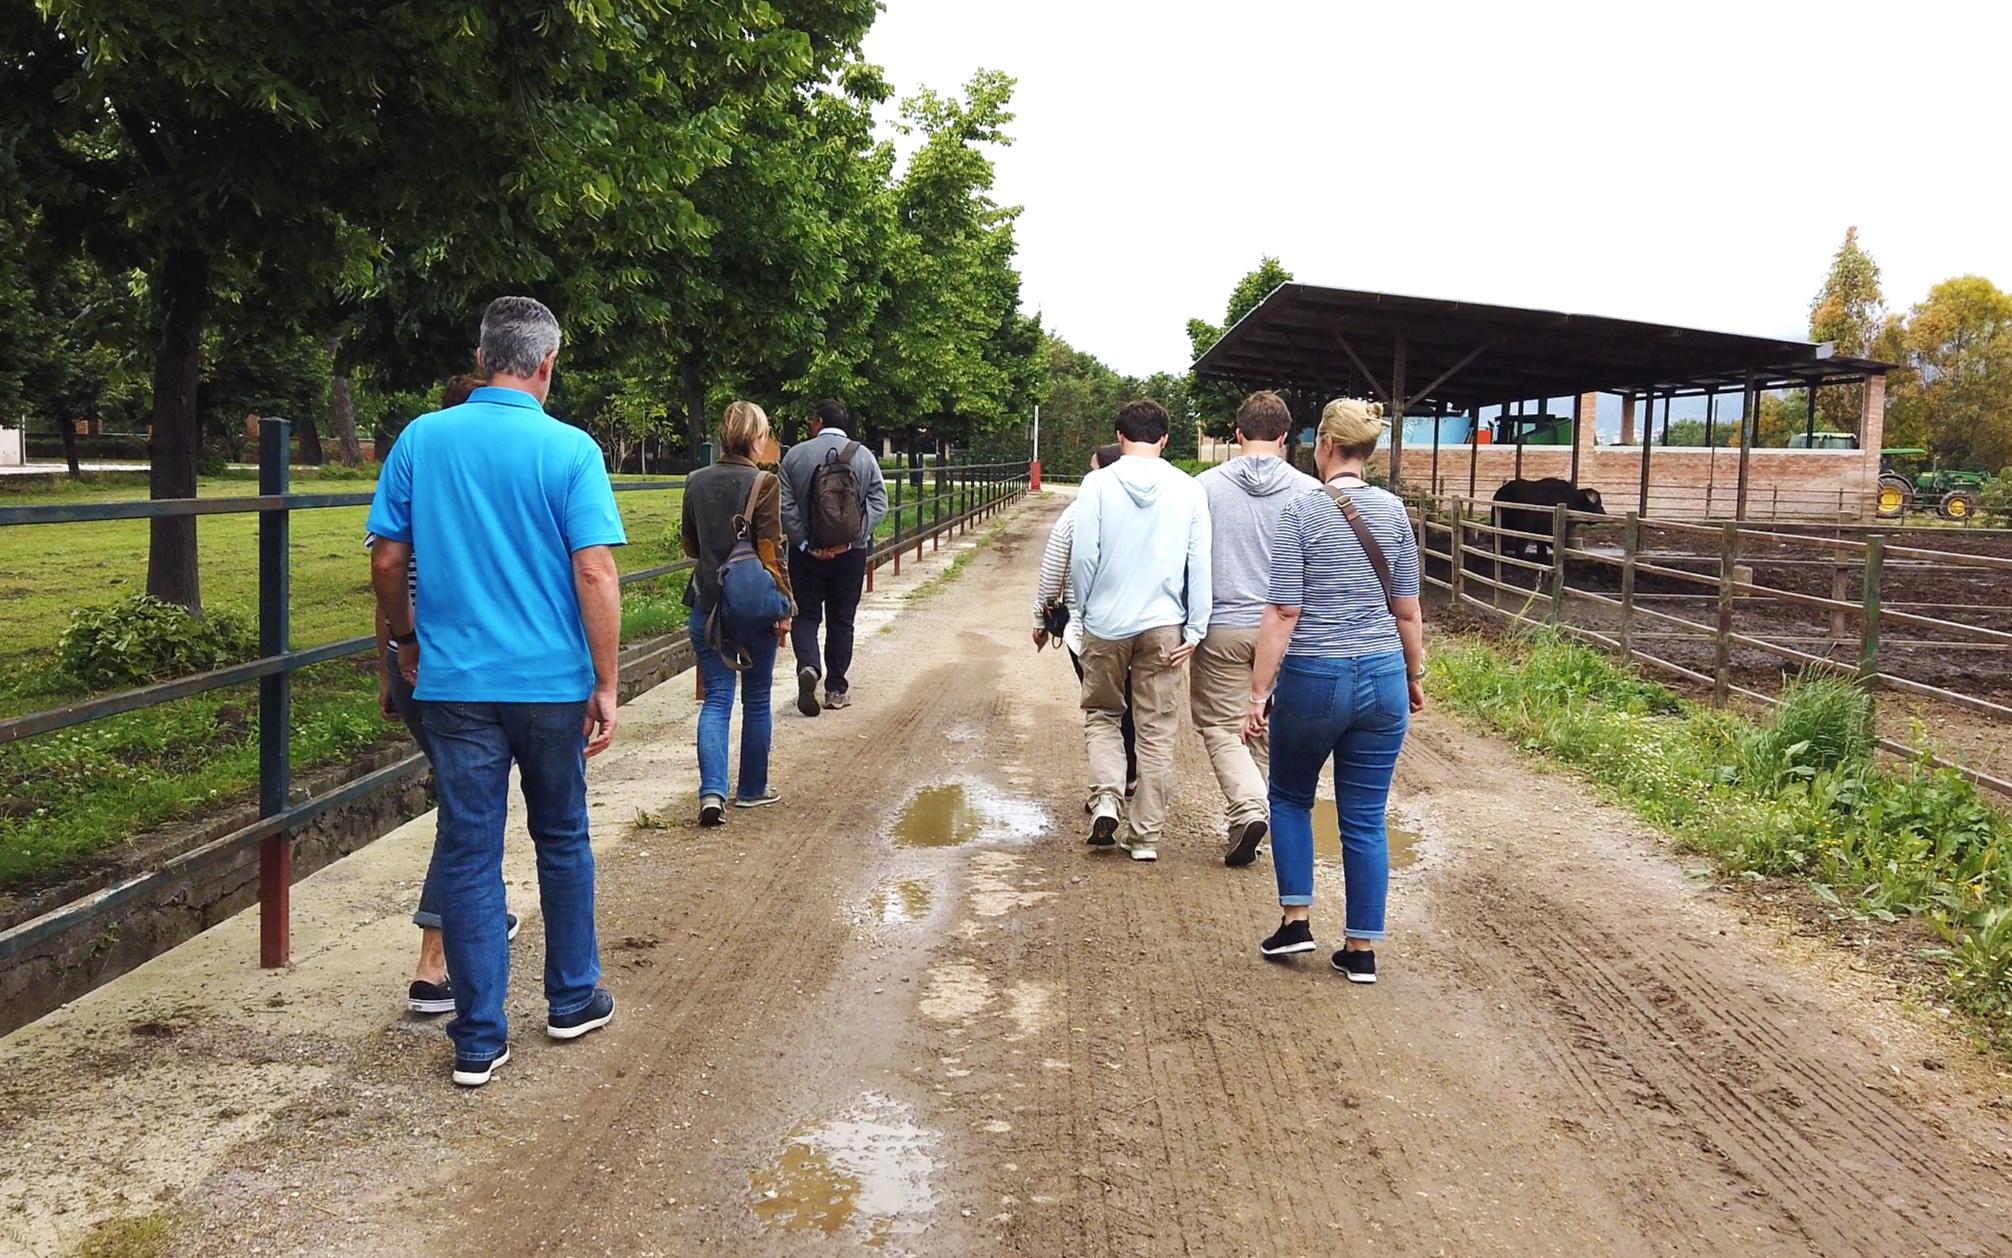 Flavia shows us round the farm.